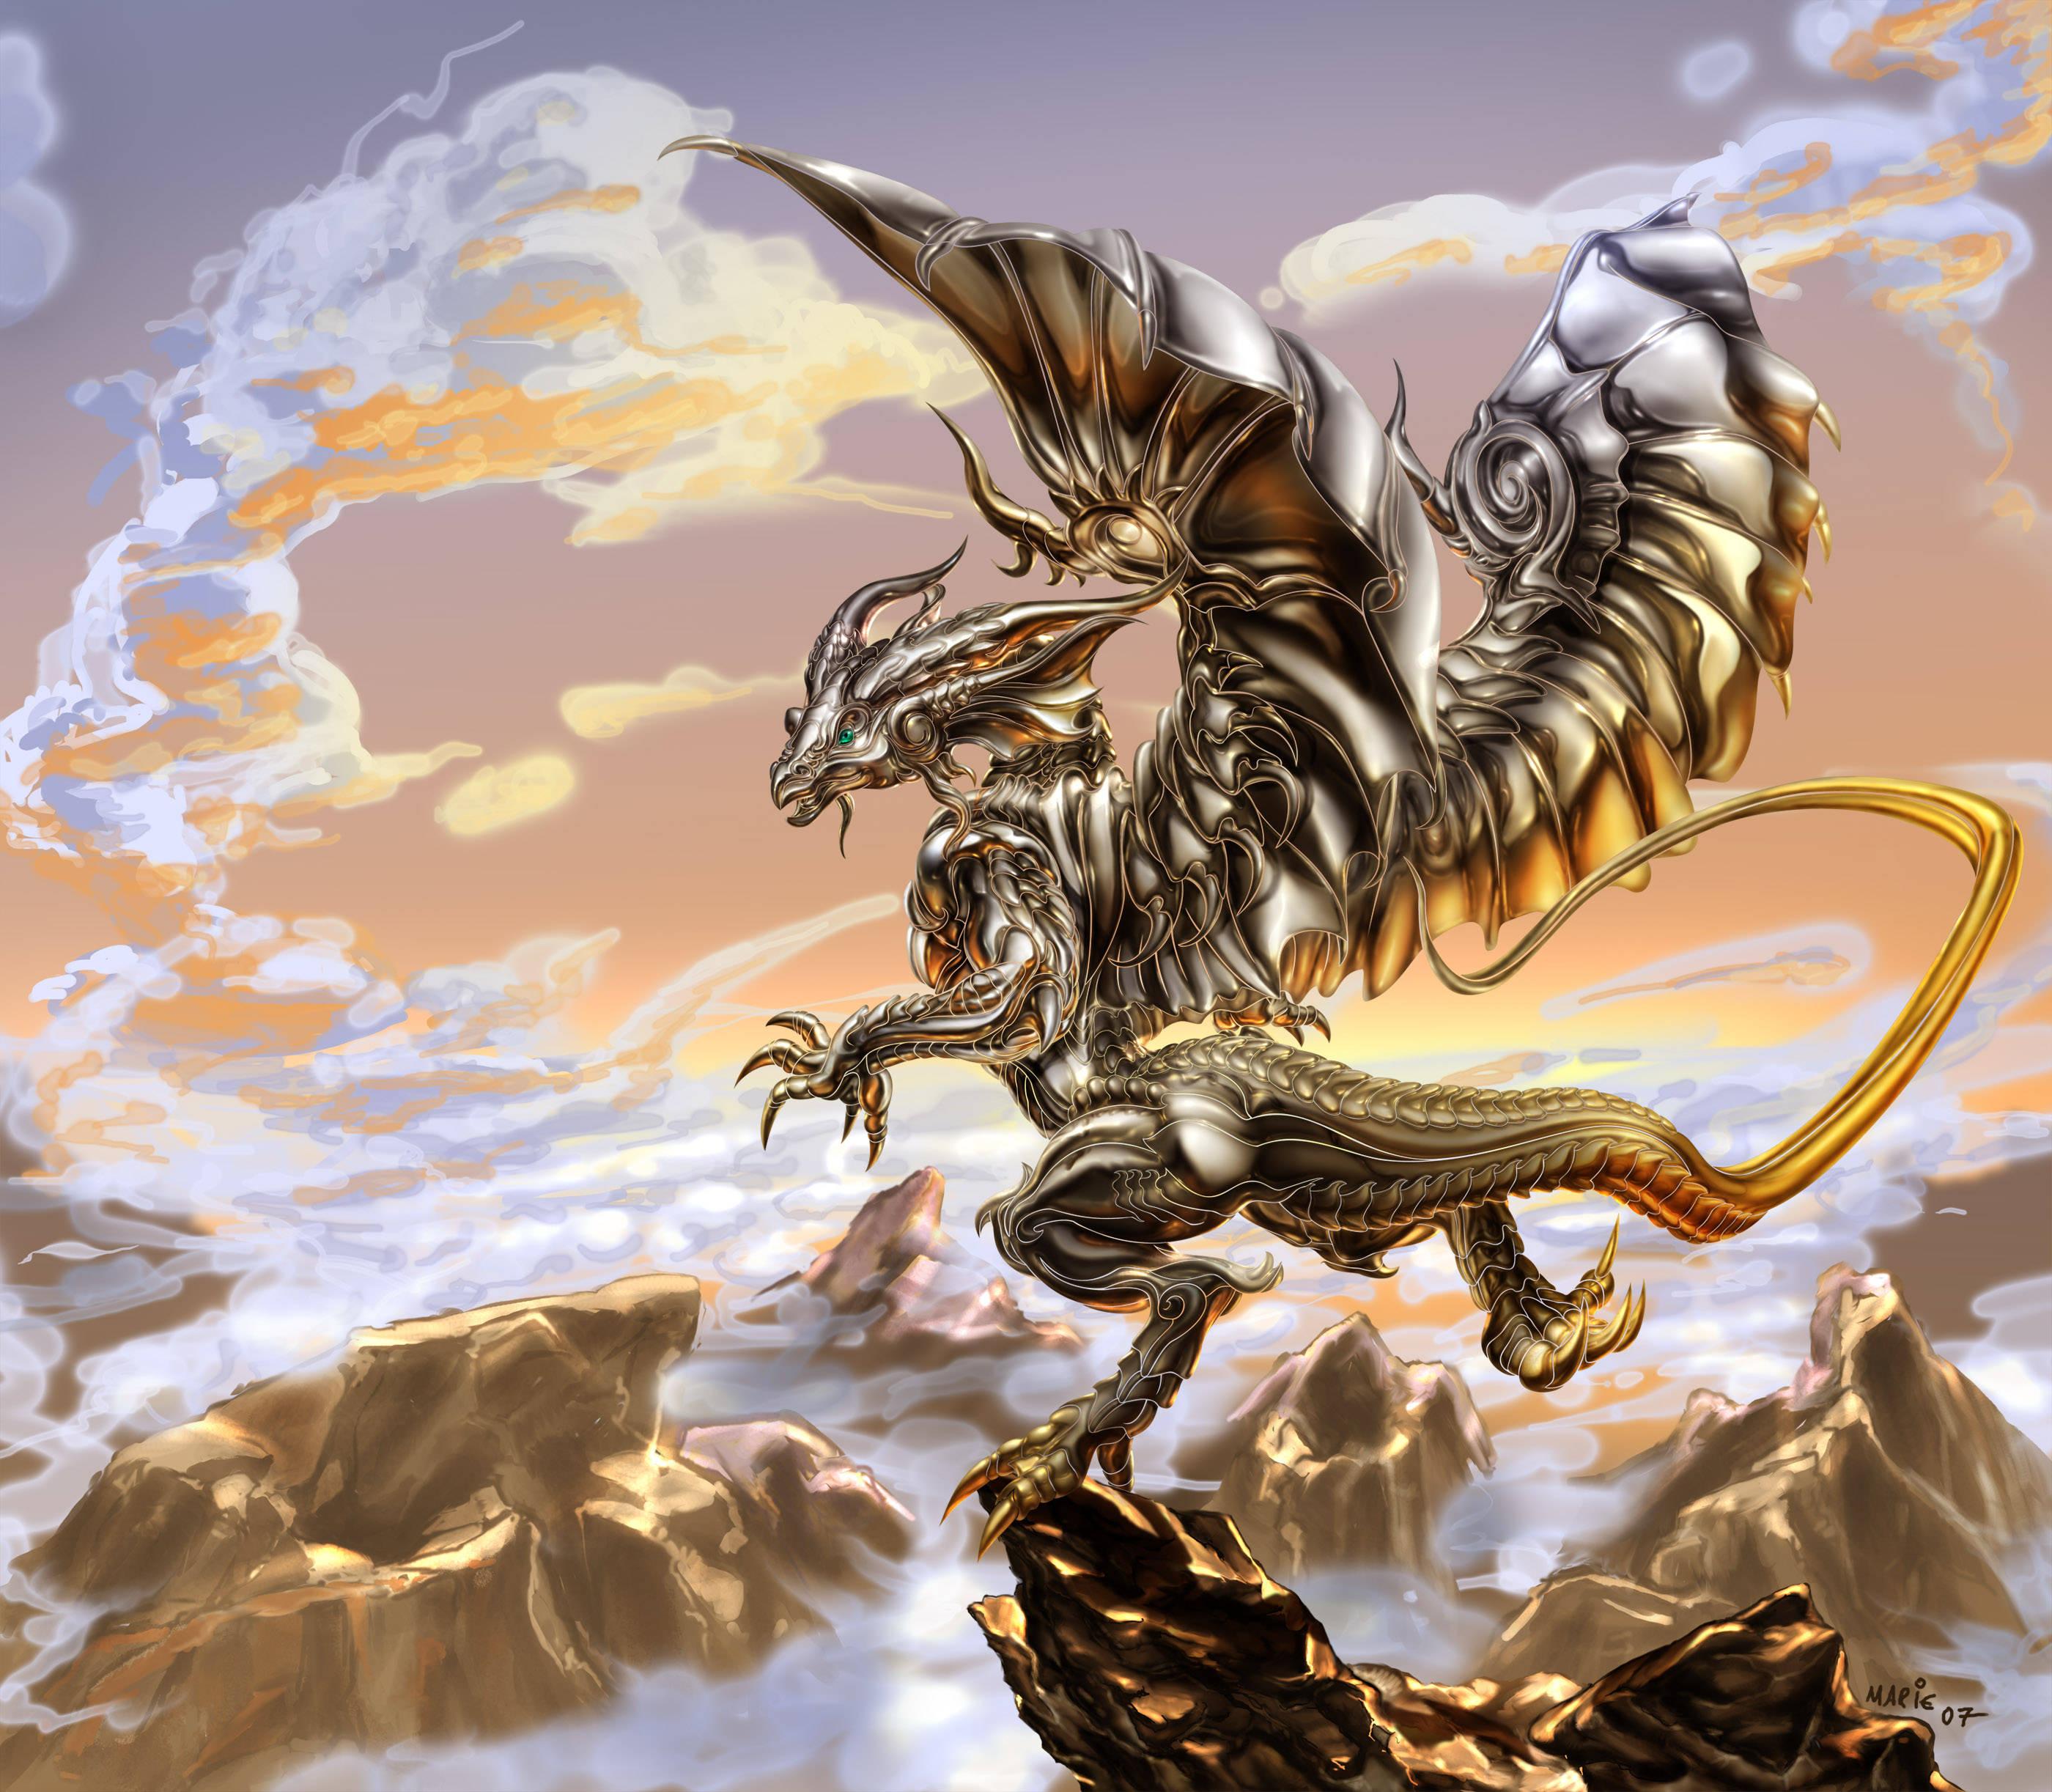 dragon type won t be given to everyone metal dragon 2800x2445